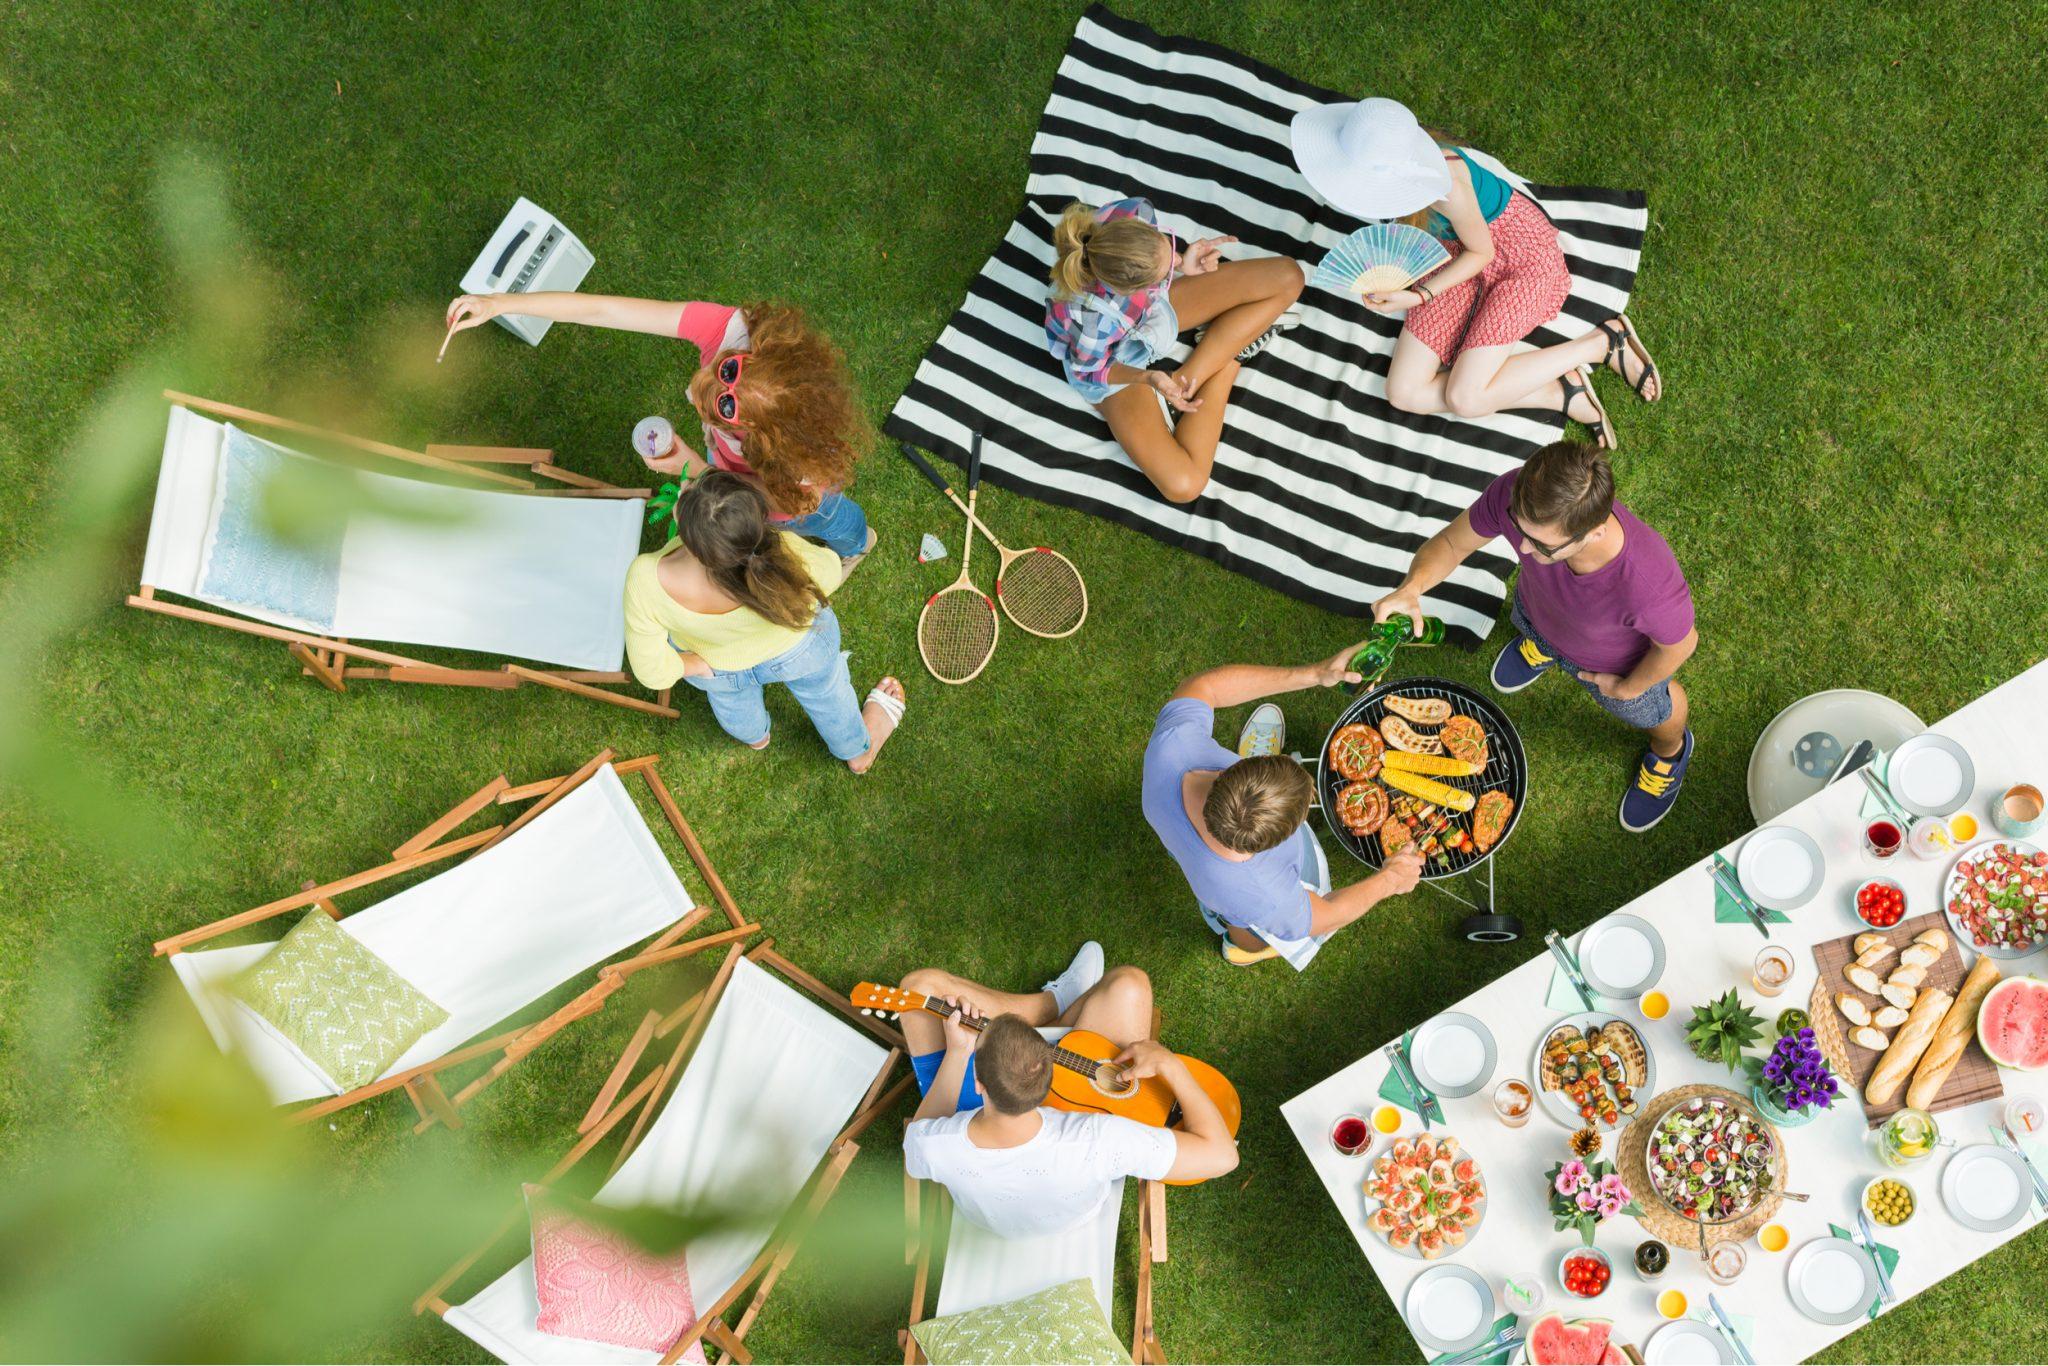 Backyard Staycation Ideas